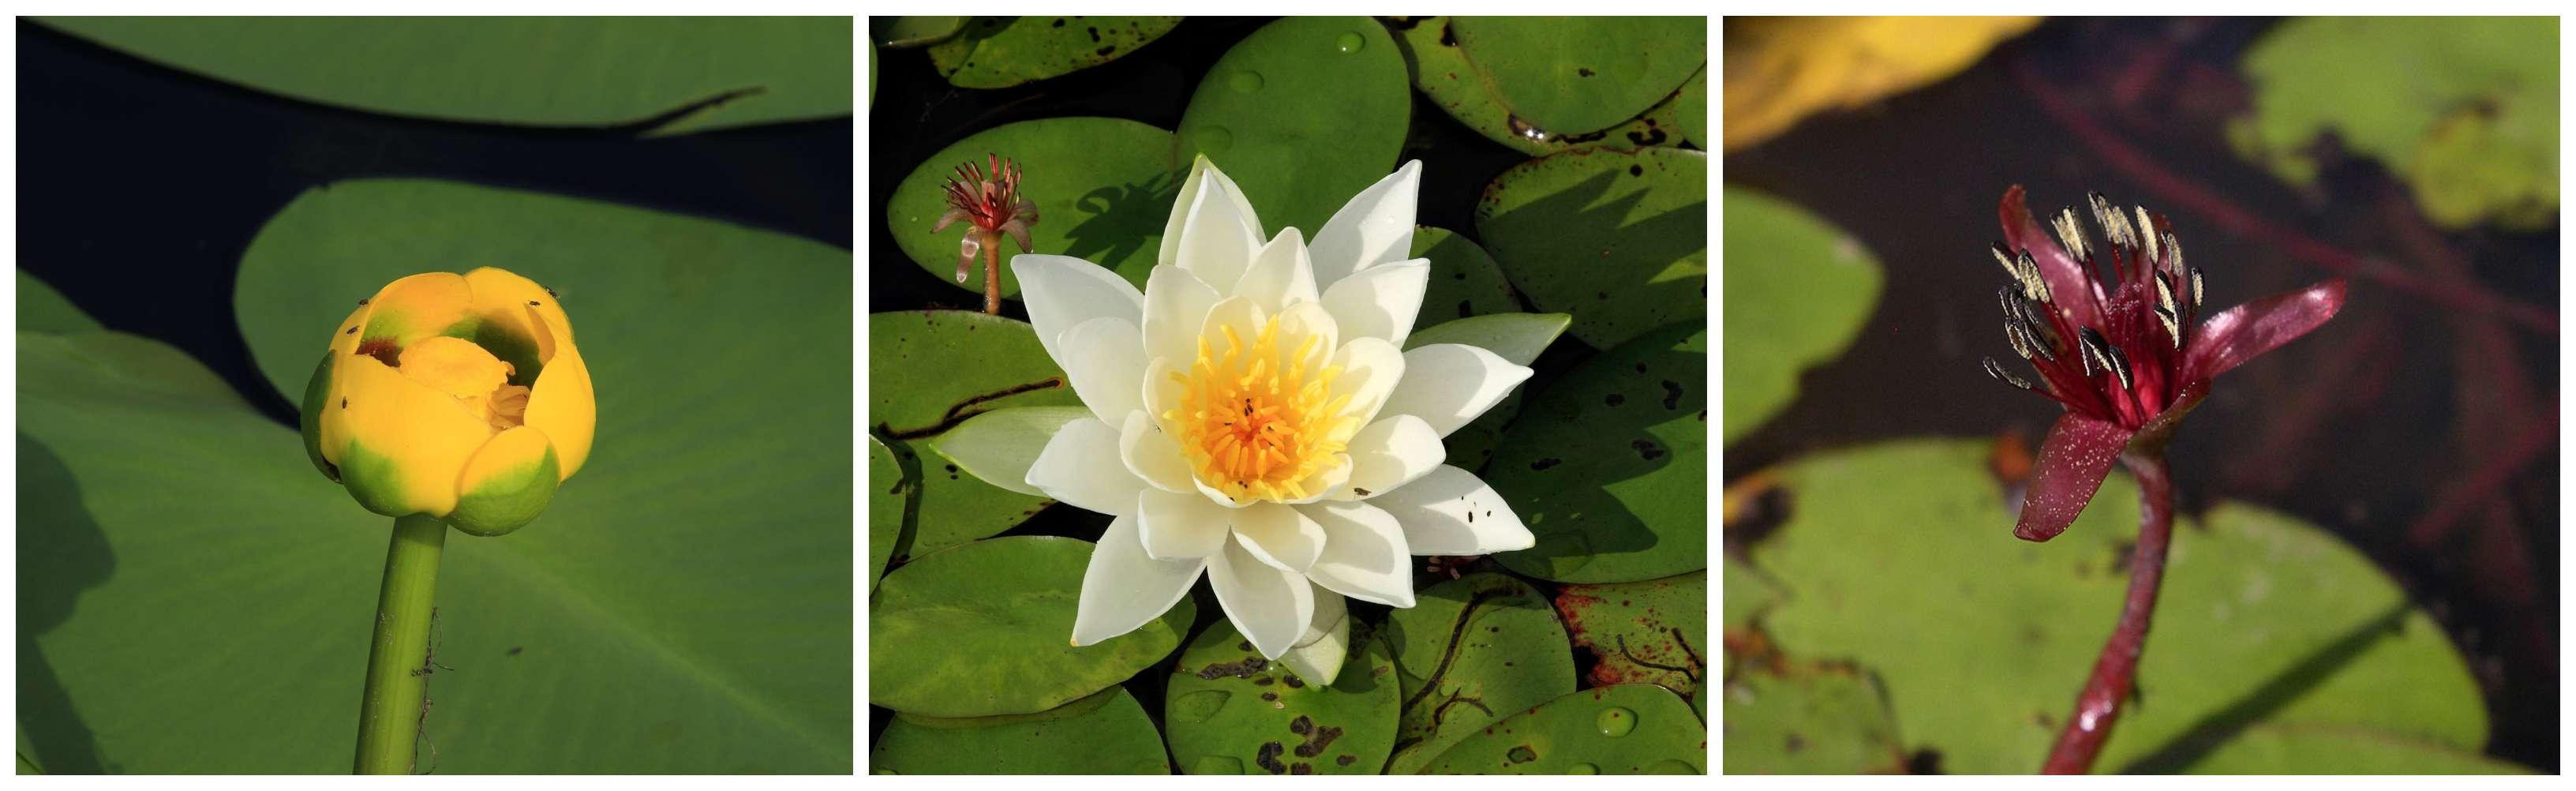 Yellow waterlily_white waterlily_watershield